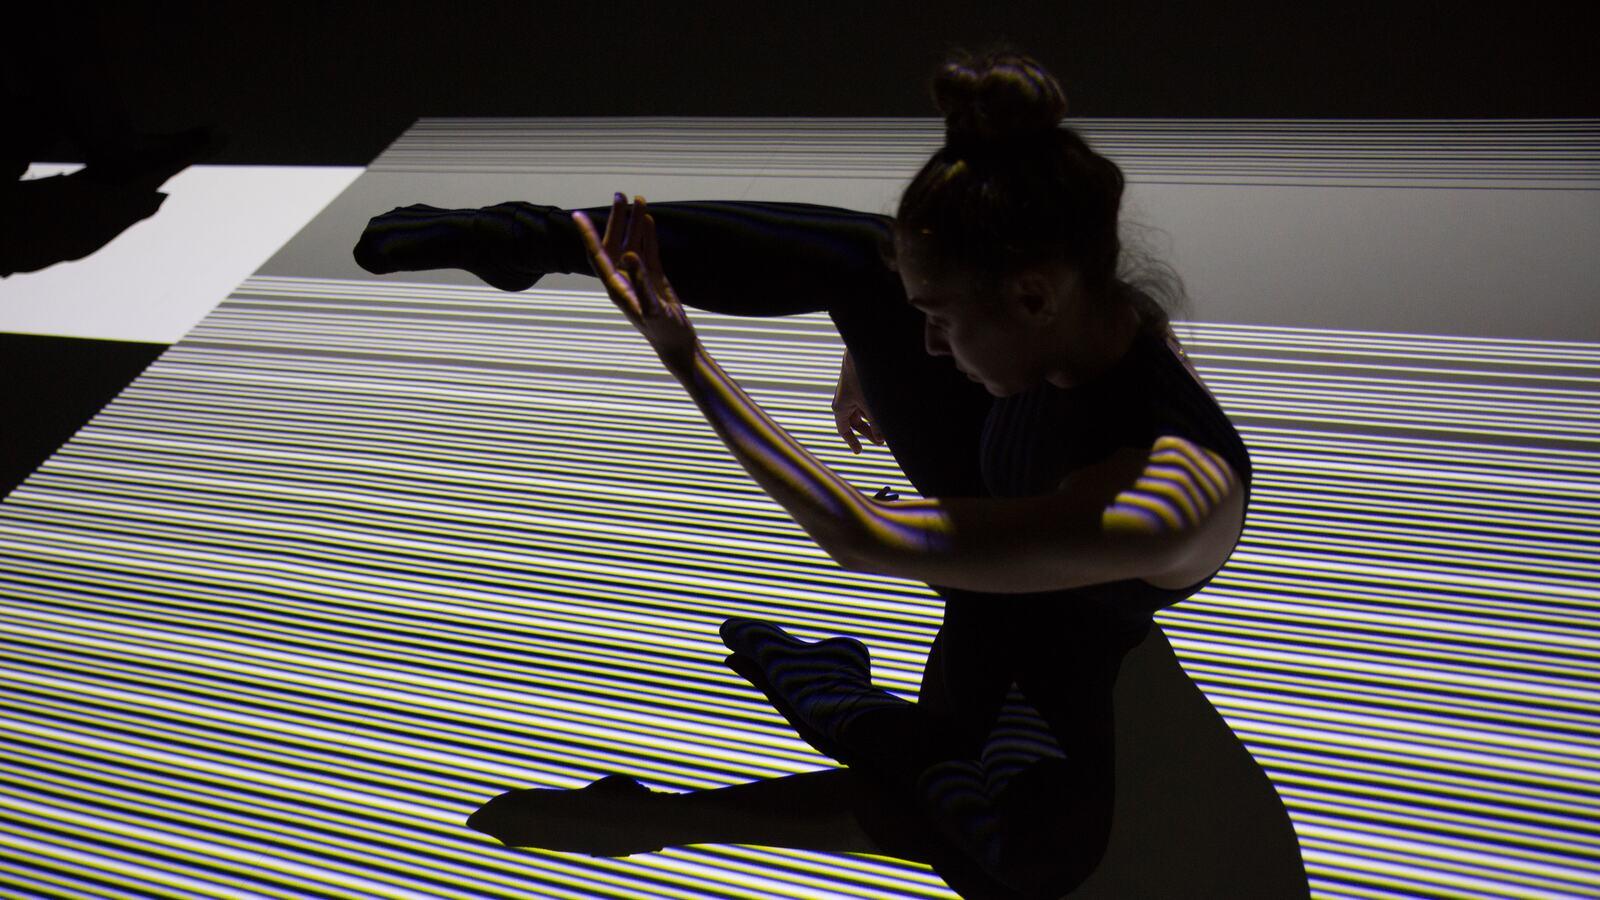 Concrete Lates x Hayward: Lorenzo Senni,Gigi FM, Shygirl, Astrid Sonne and Body Motion